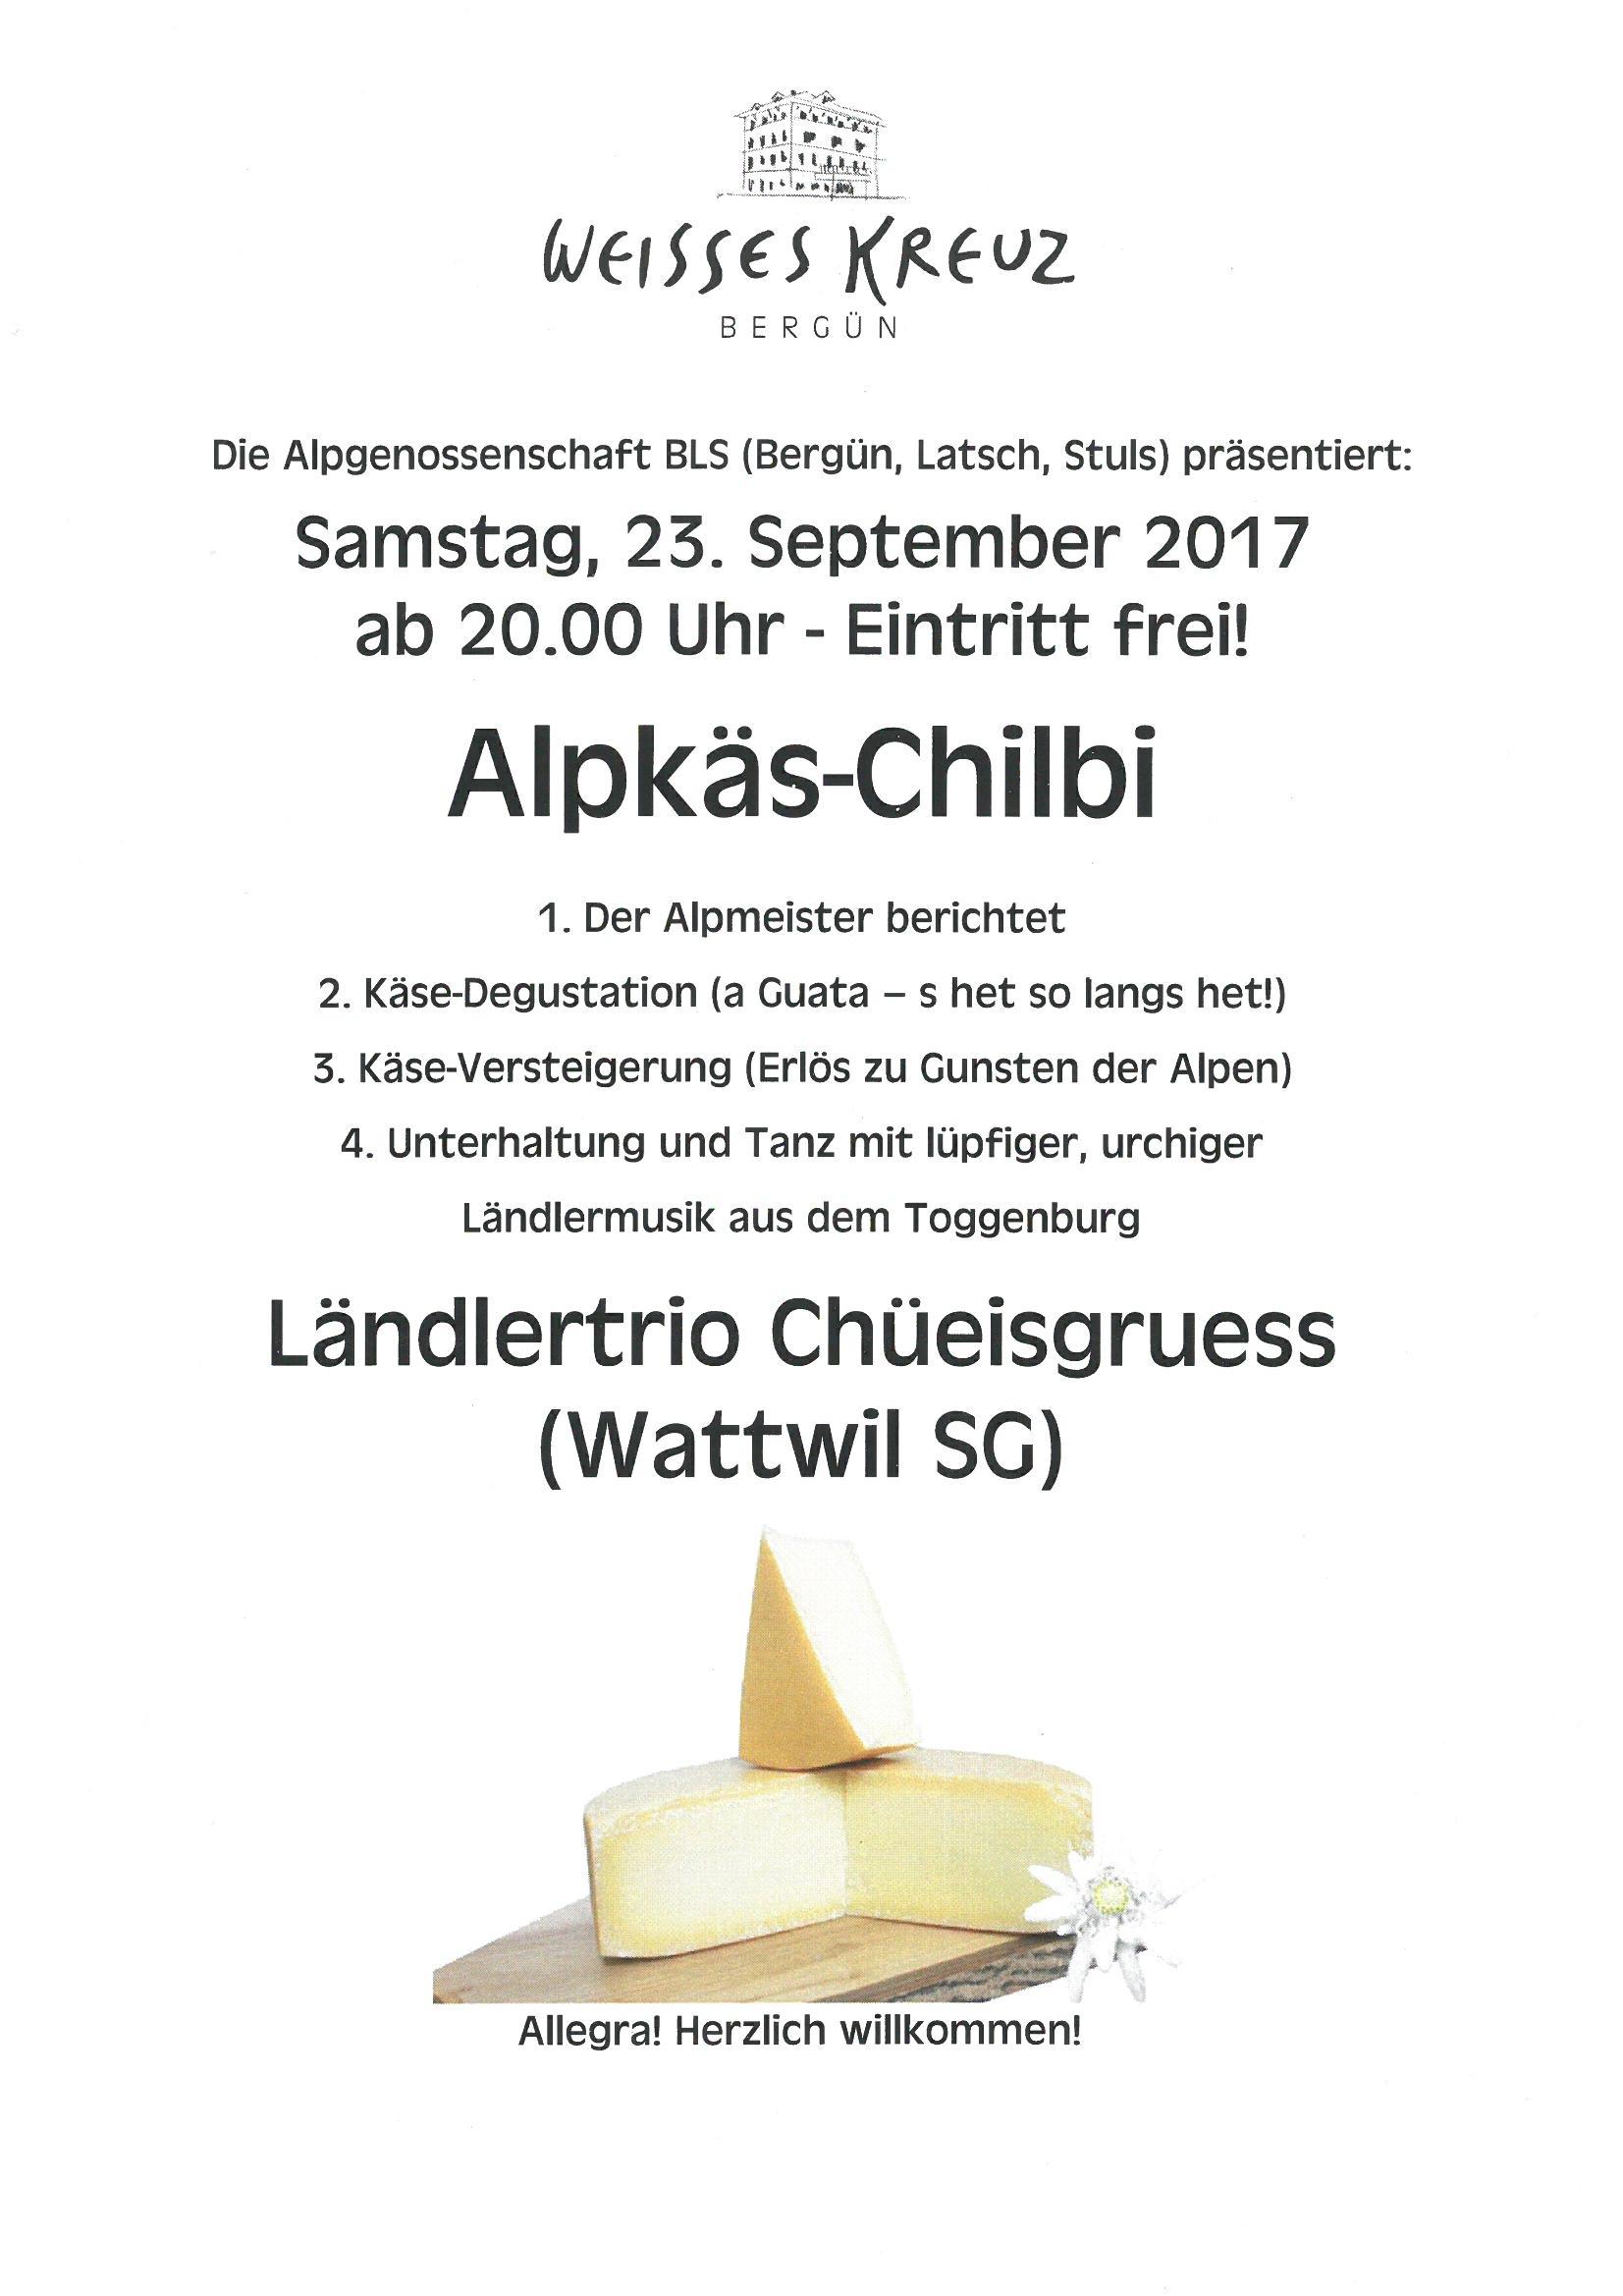 Alpkäs-Chilbi im Weissen Kreuz